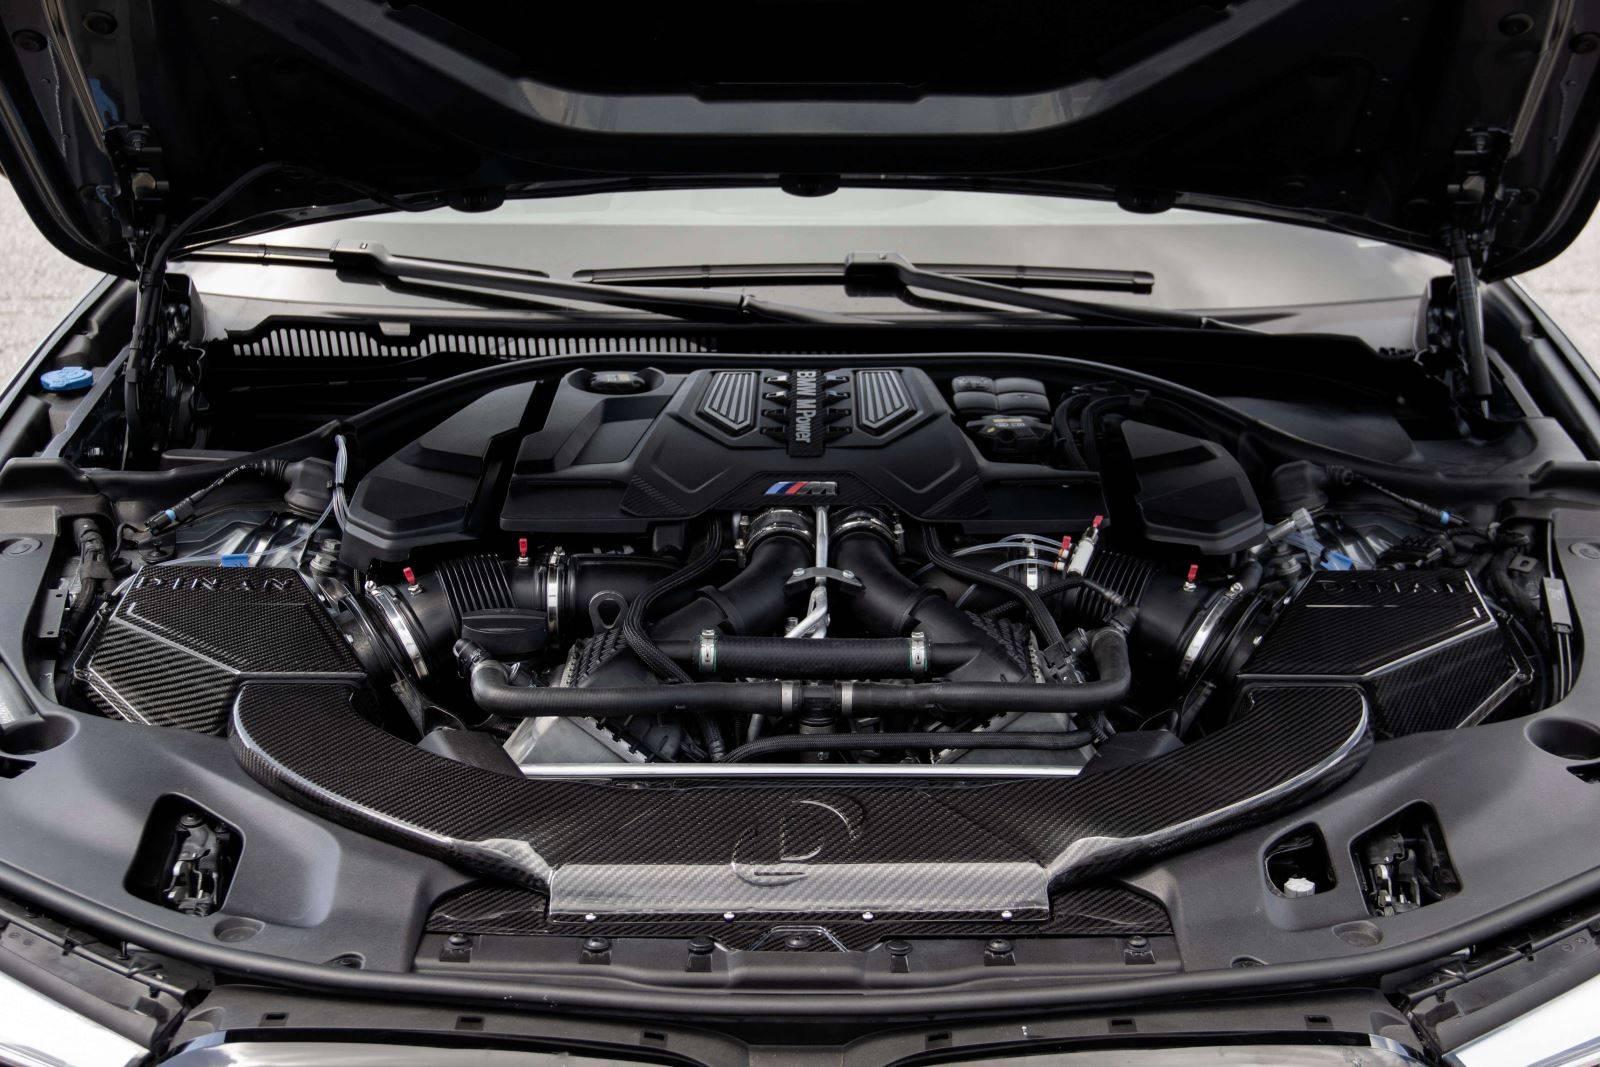 Карбоновый впуск Dinan для BMW M5 F90 1